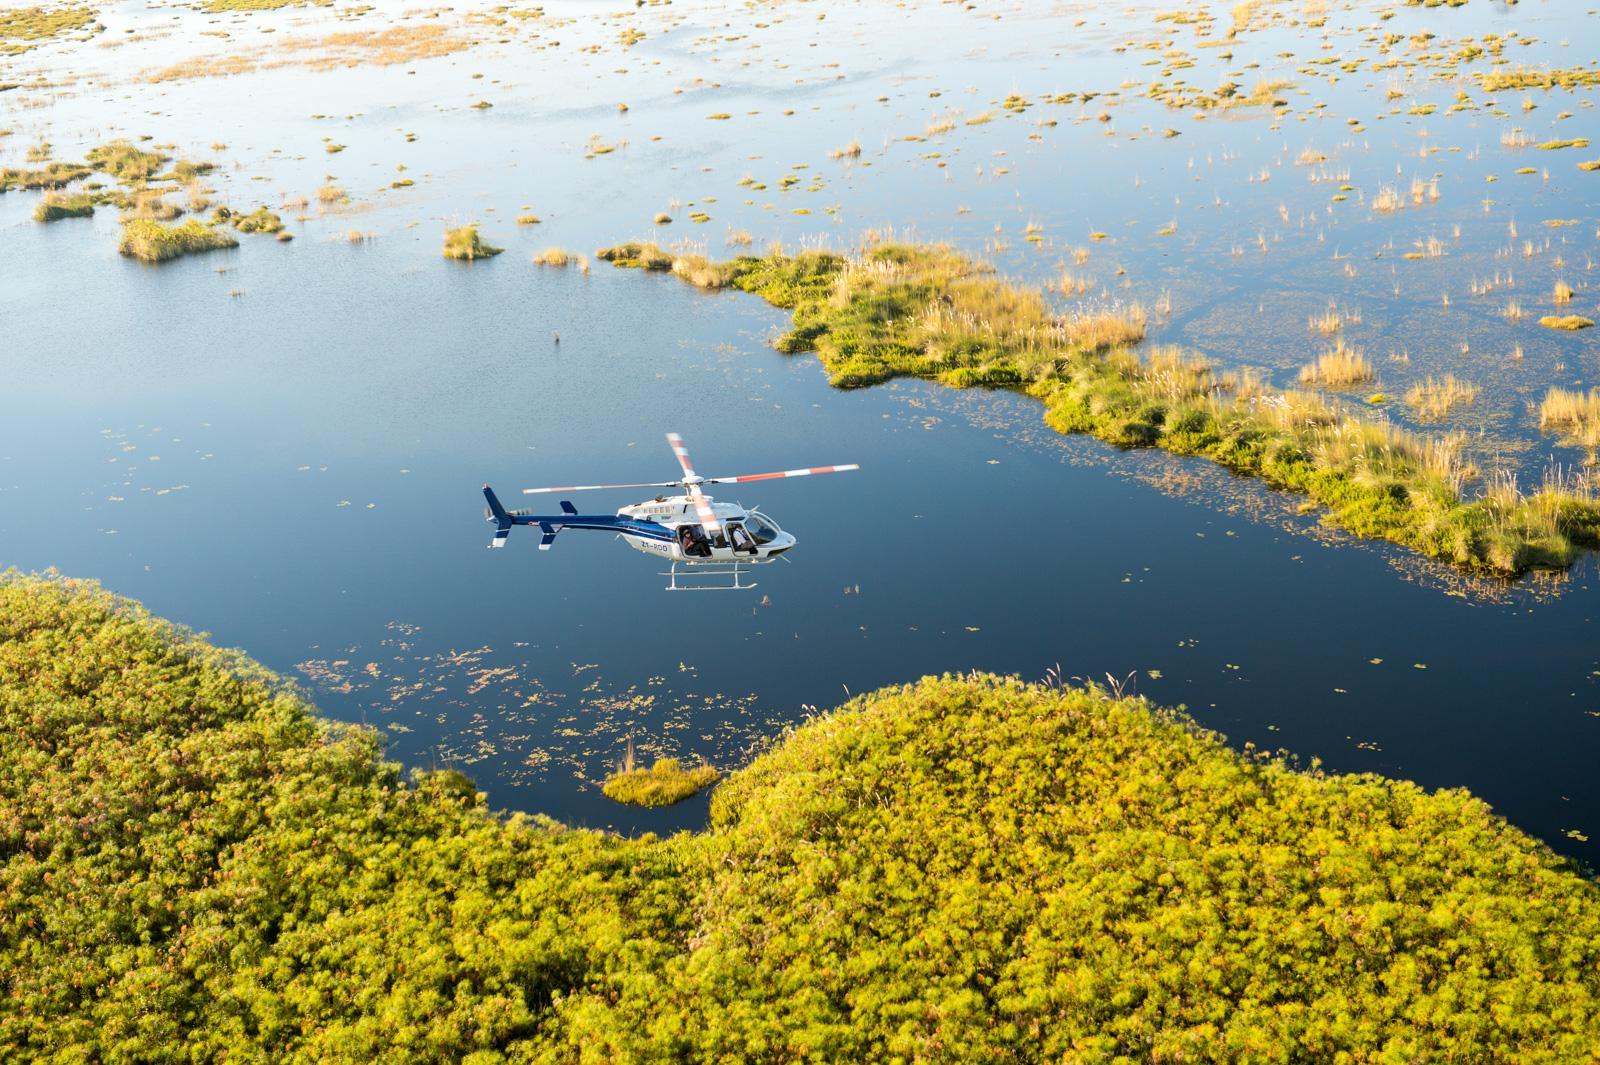 social_helicopterhorizons_botswana_cwww.marcstickler.at300.jpg